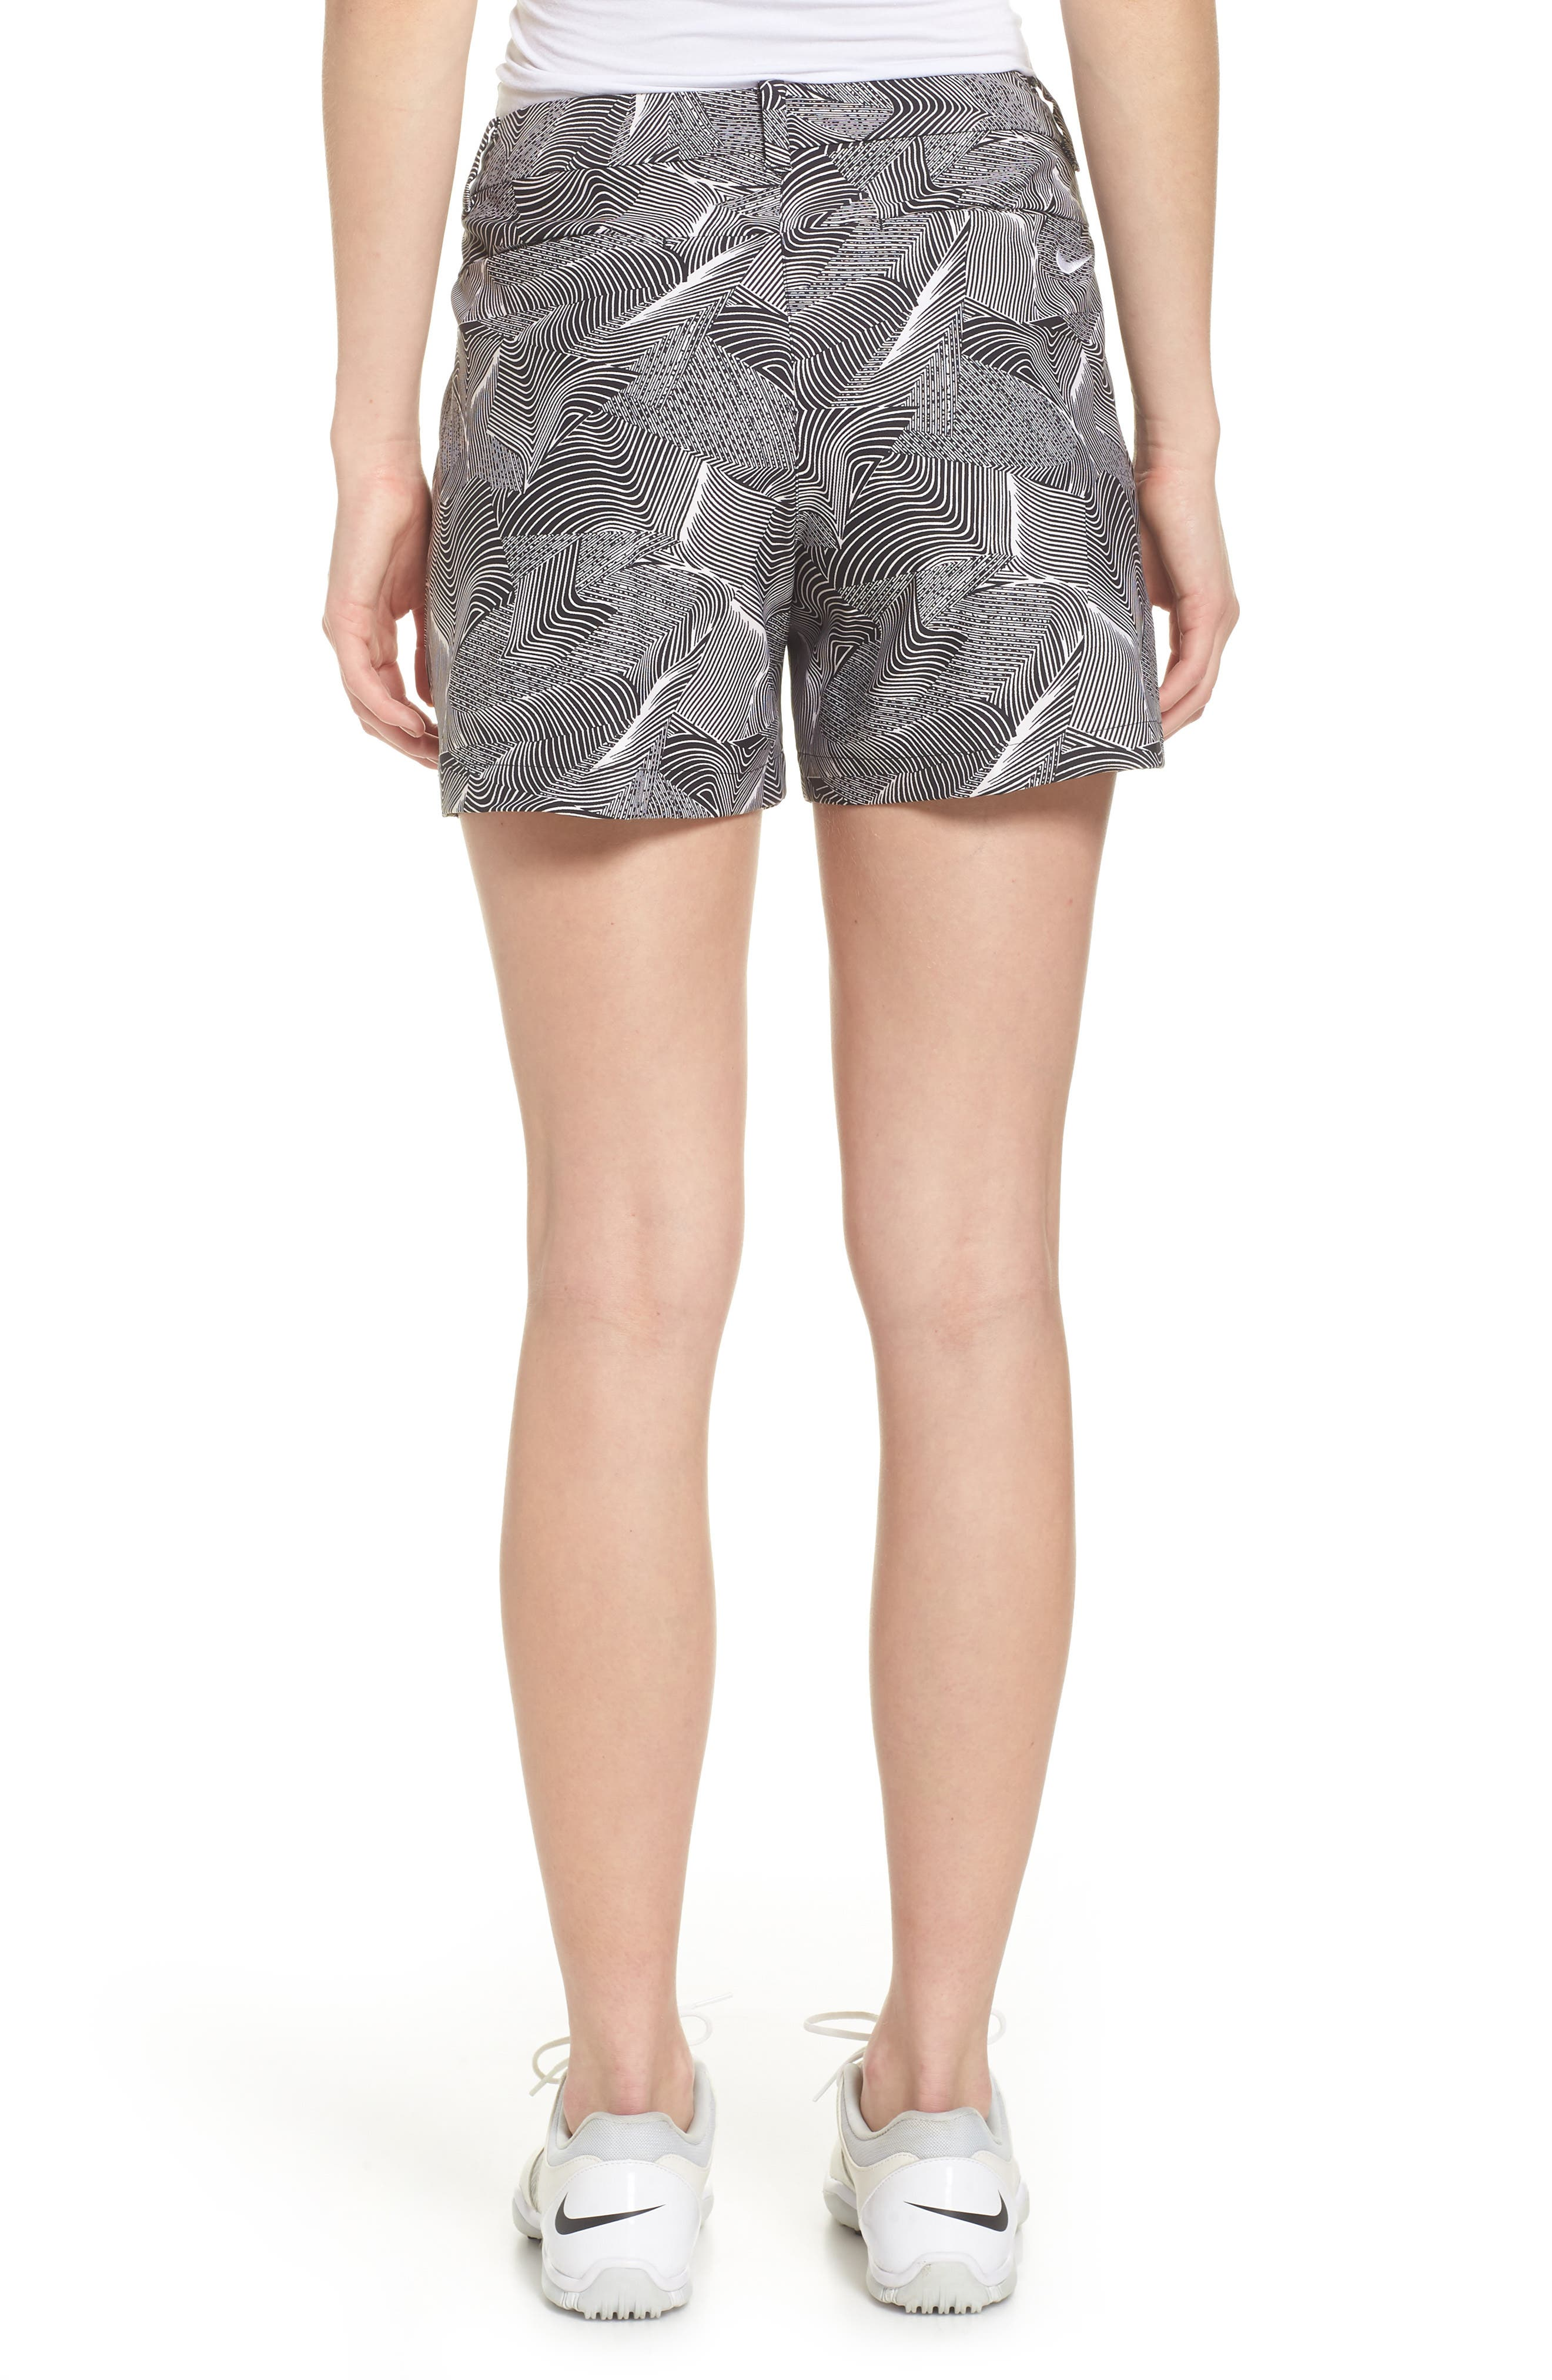 Flex Golf Shorts,                             Alternate thumbnail 2, color,                             White/ Black/ White